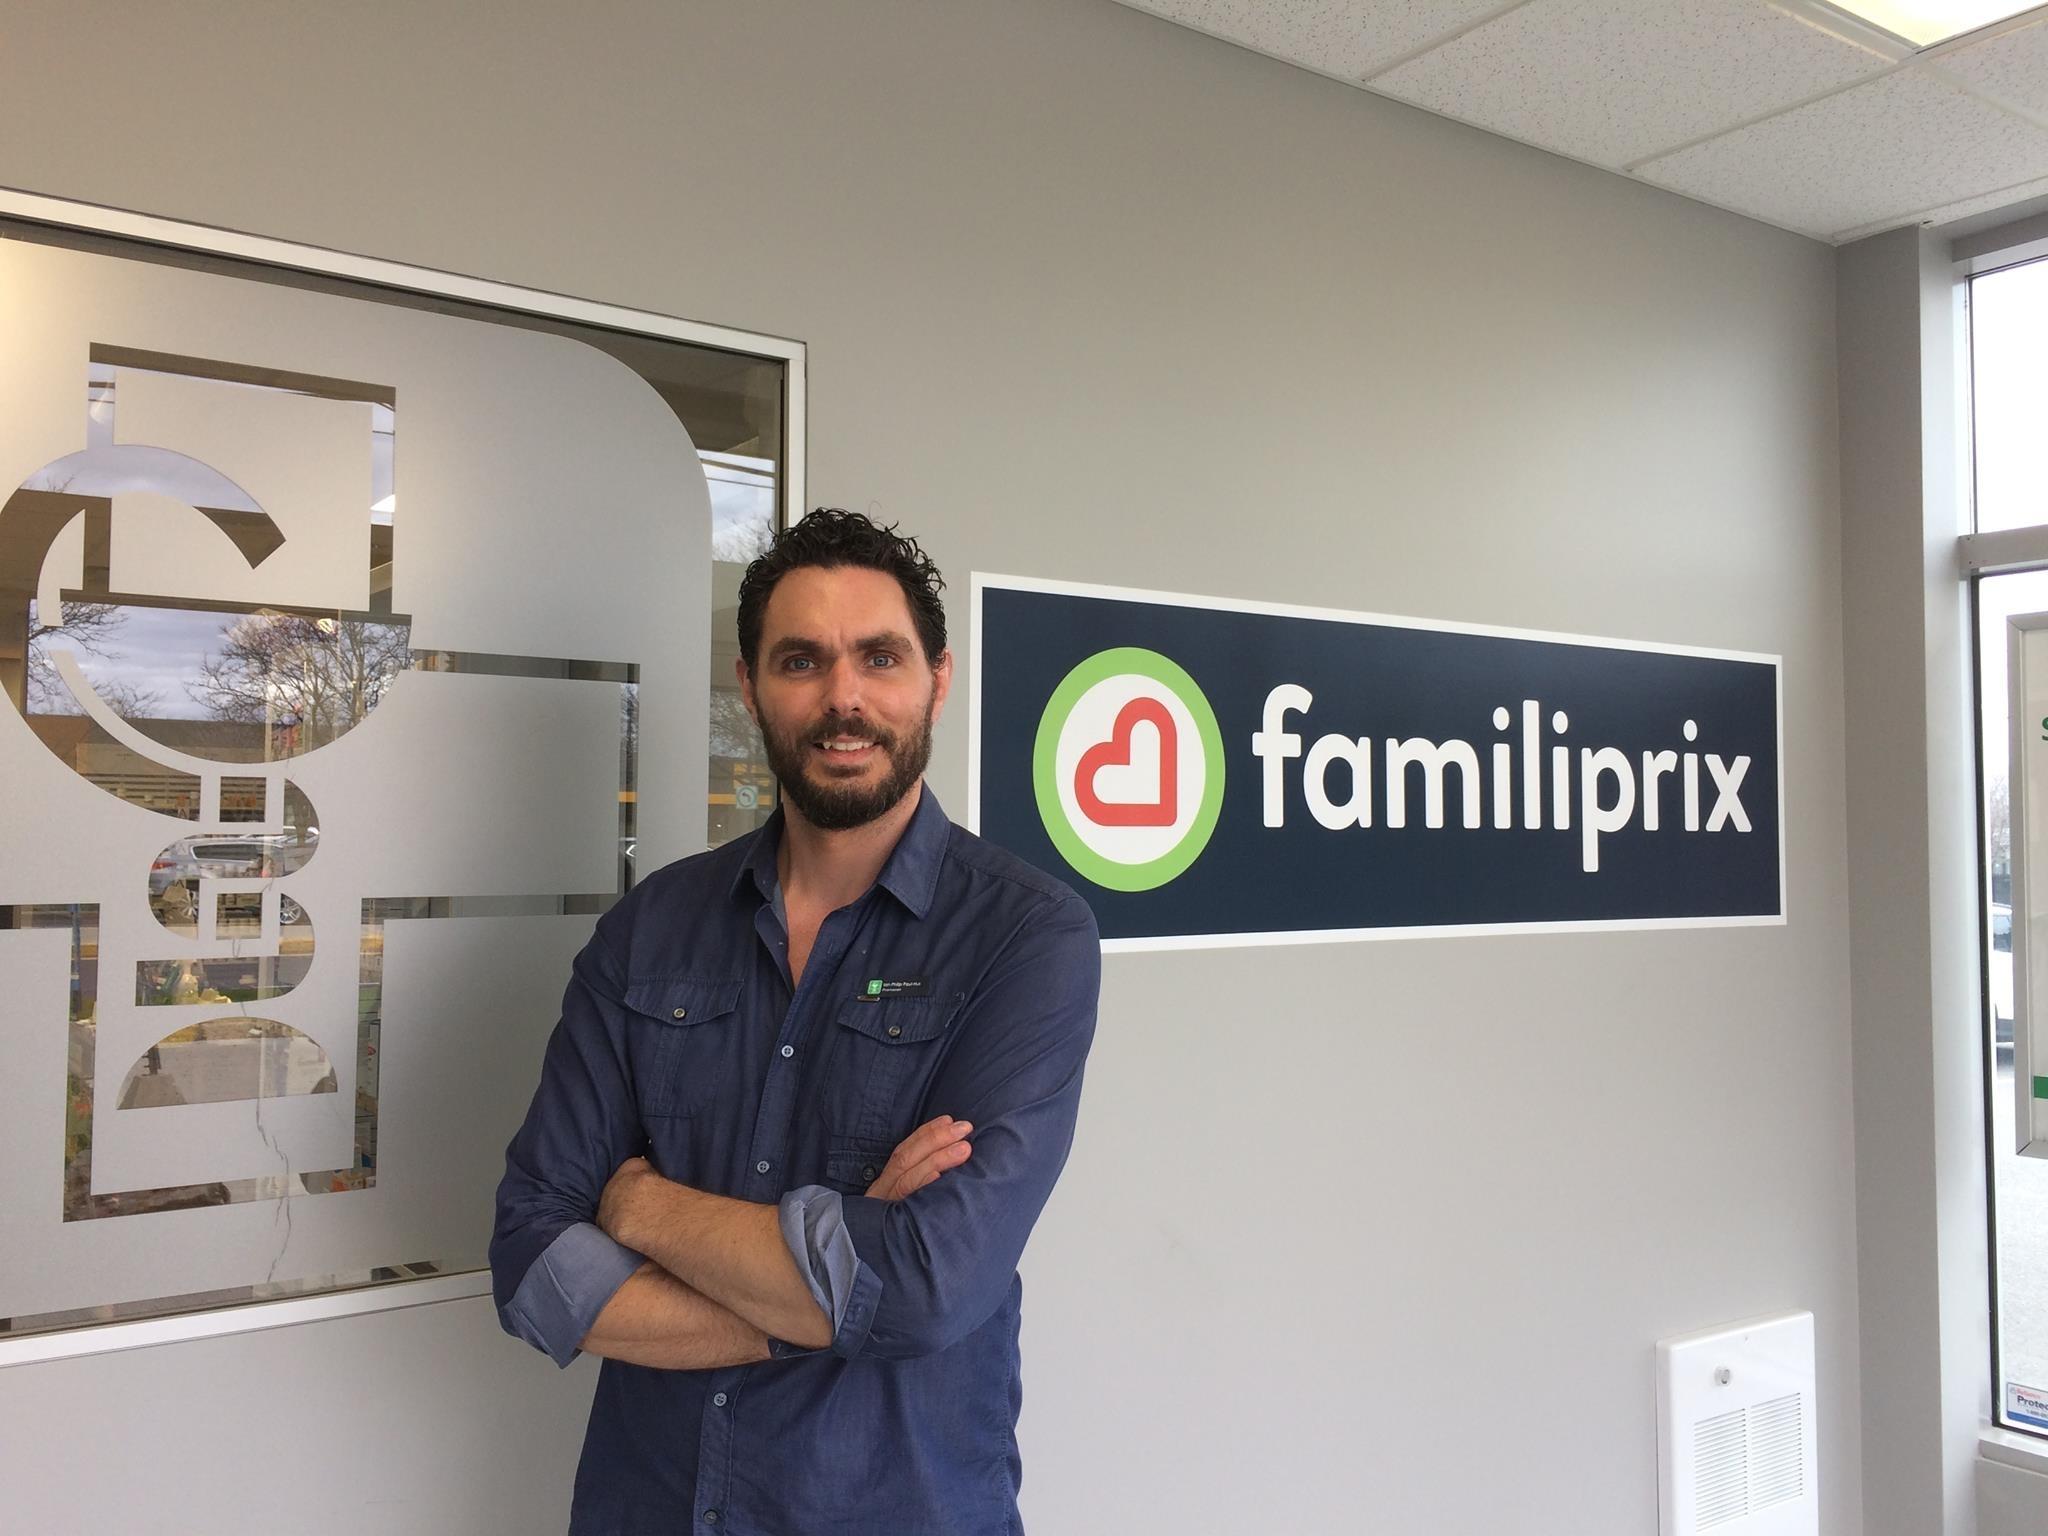 Familiprix Ian-Philip Paul-Hus (Pharmacie Affiliée